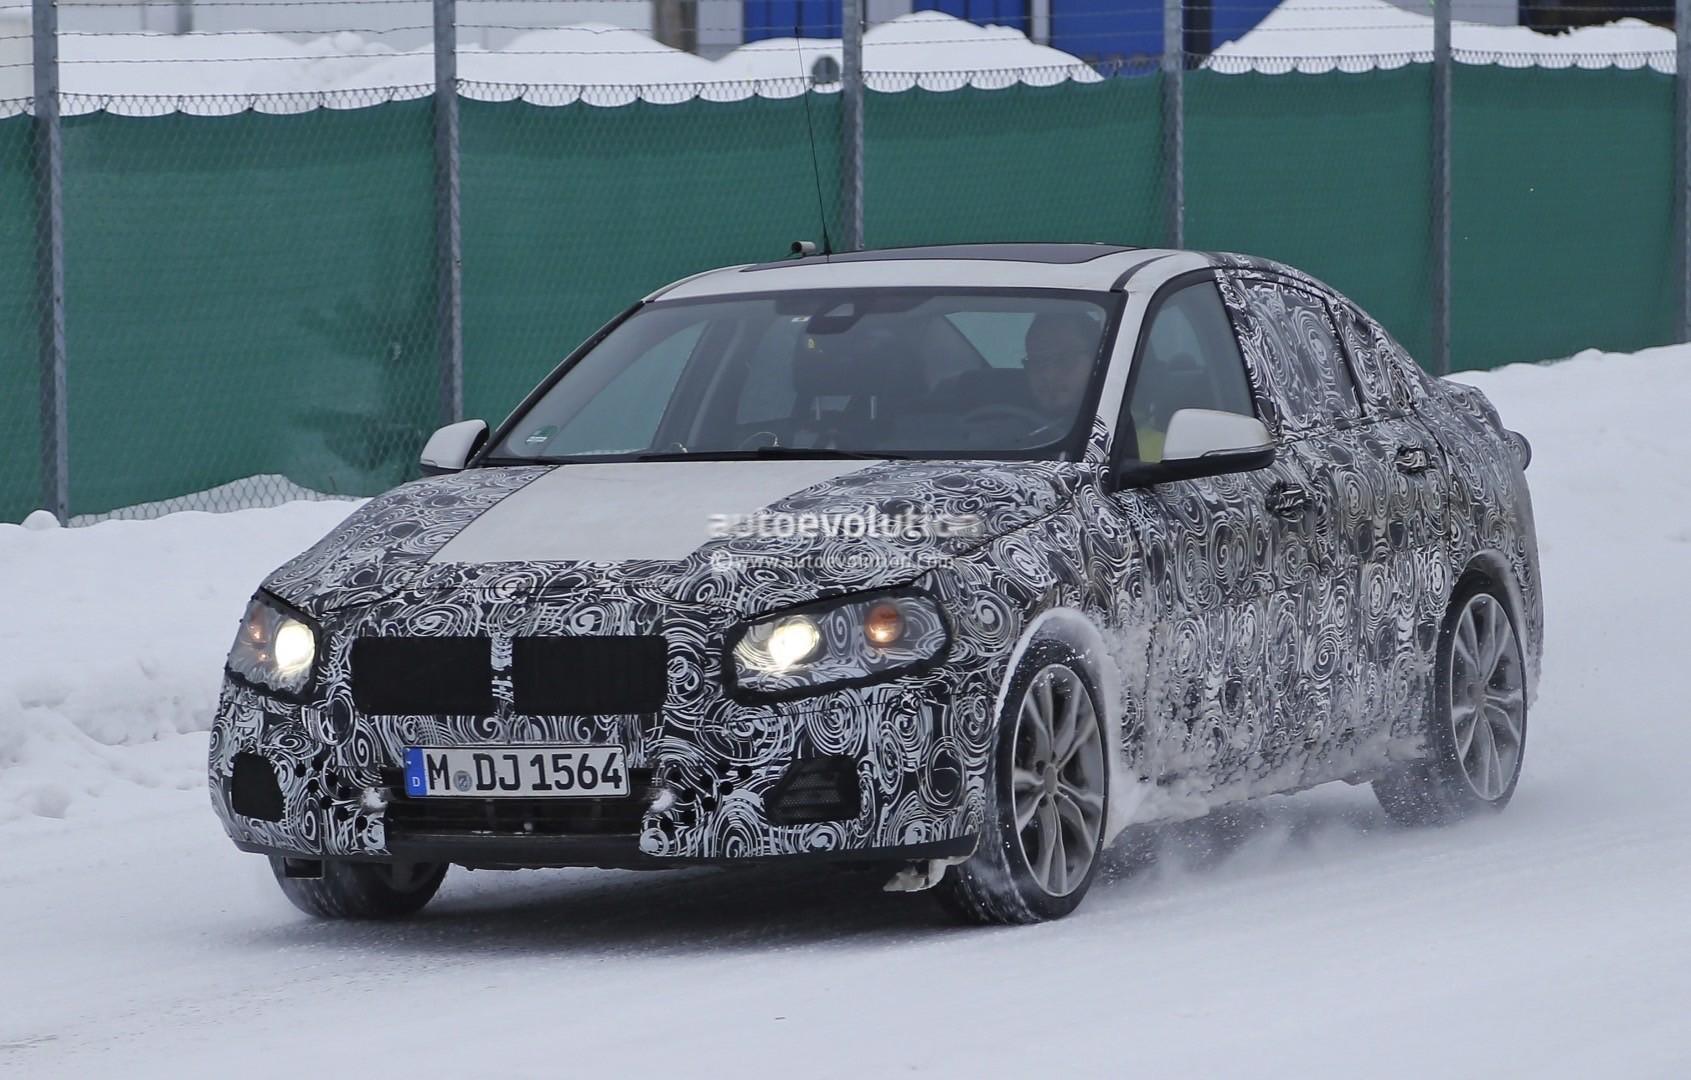 2016-bmw-f52-1-series-sedan-spotted-winter-testing-photo-gallery_1